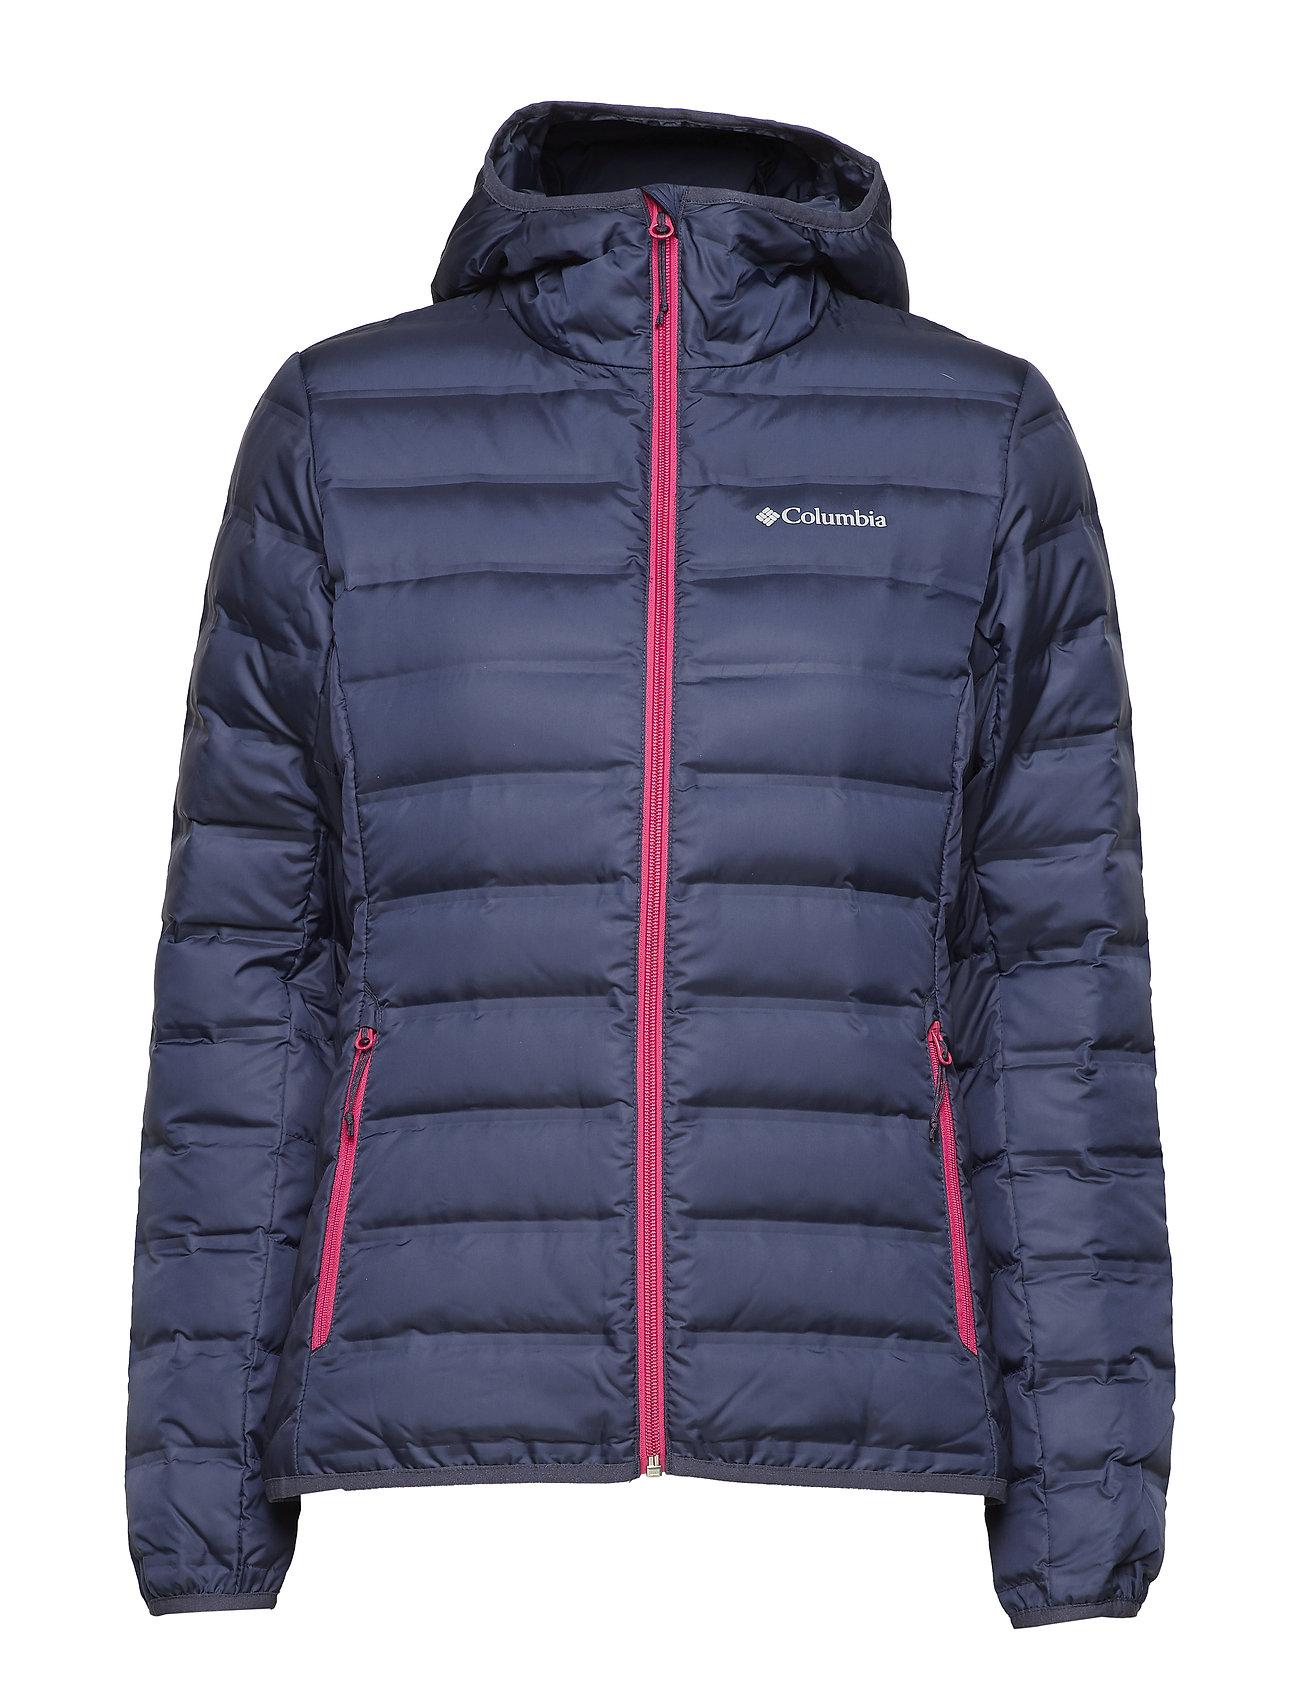 Lake 22? Hooded Jacket Foret Jakke Blå COLUMBIA